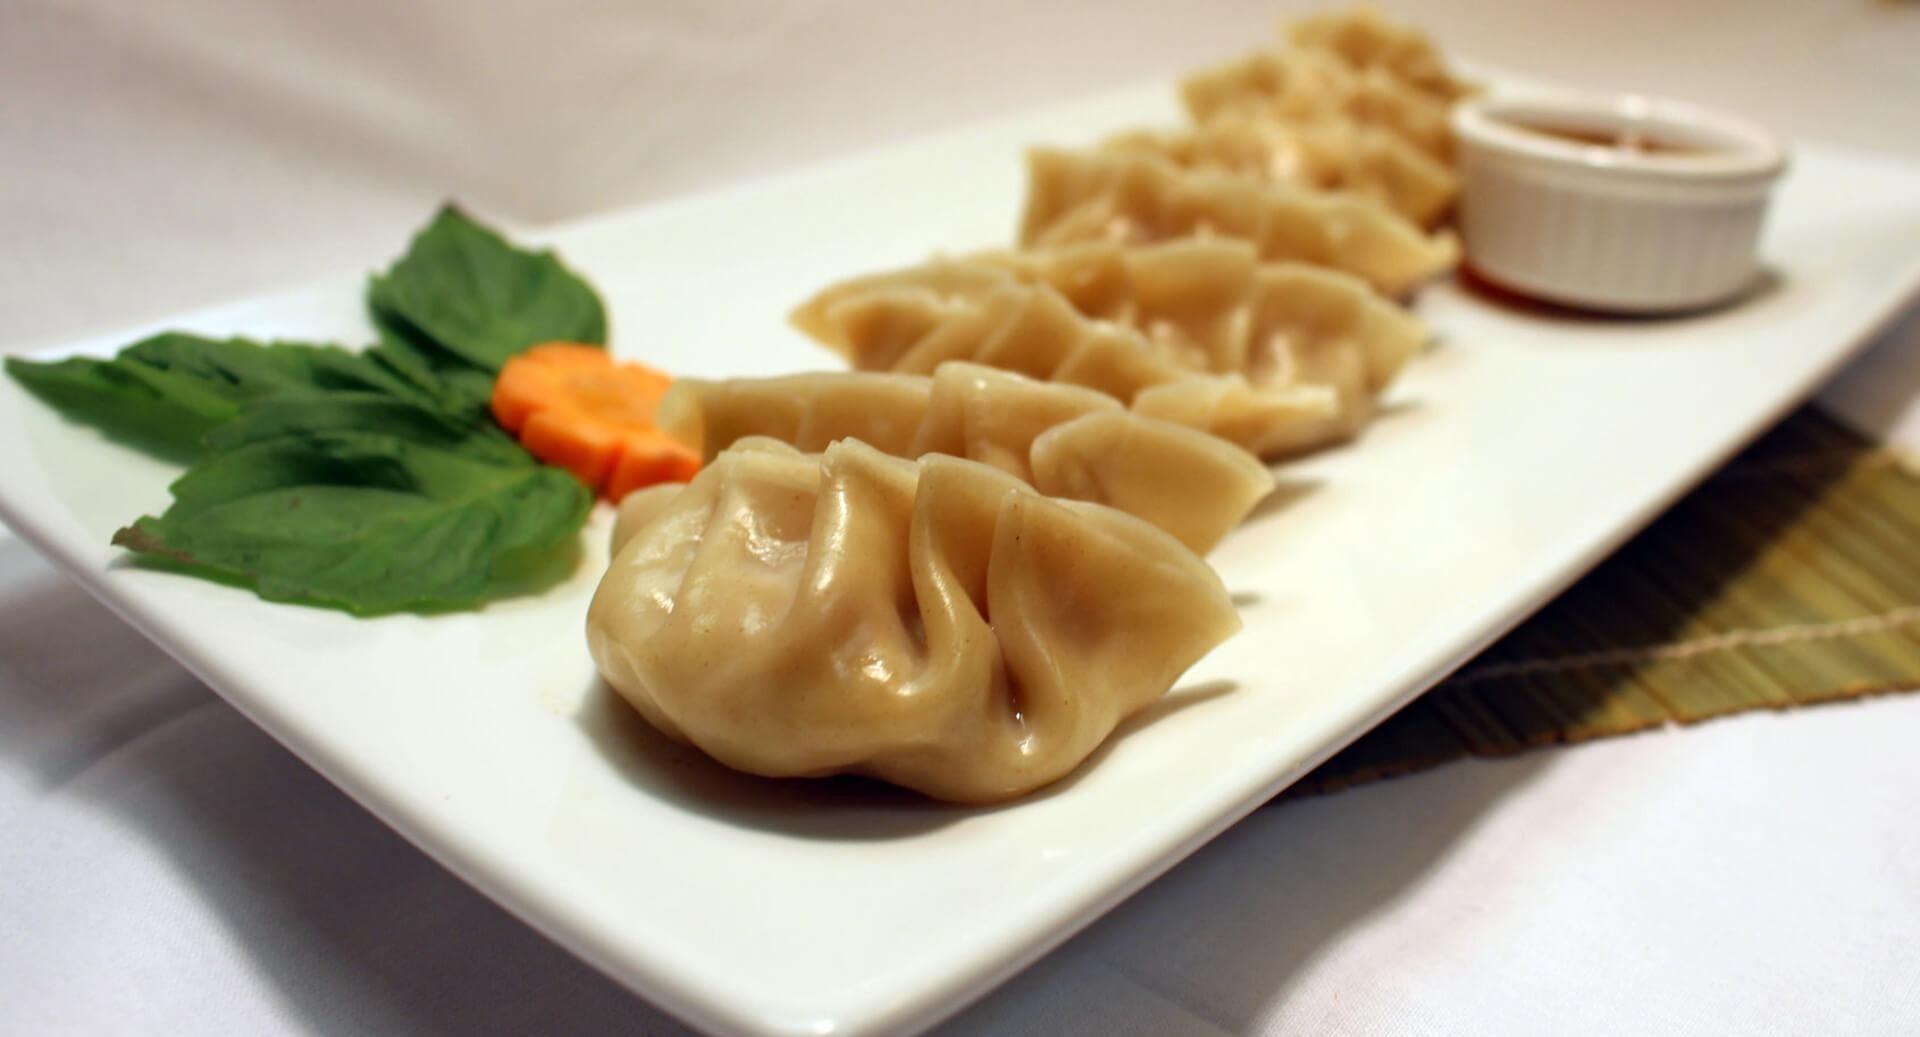 The Everest Cuisine